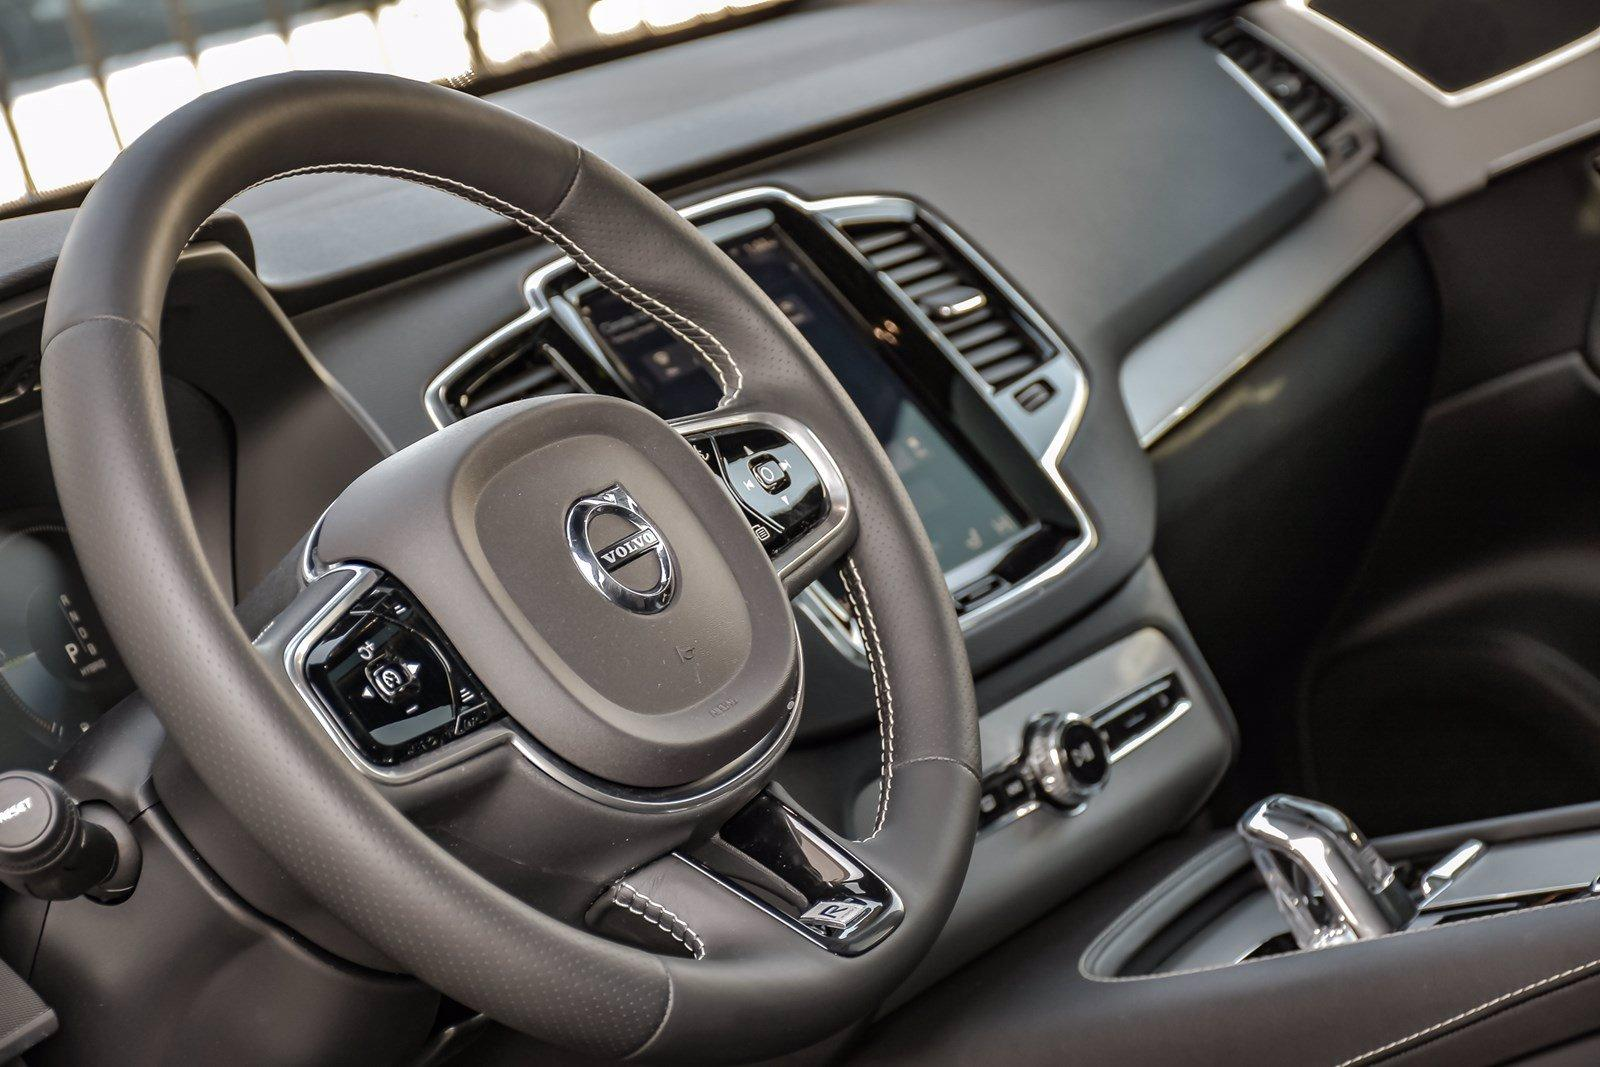 2017 Volvo Xc90 T8 R Design Hybrid Stock Bd307b For Sale Near Downers Grove Il Il Volvo Dealer